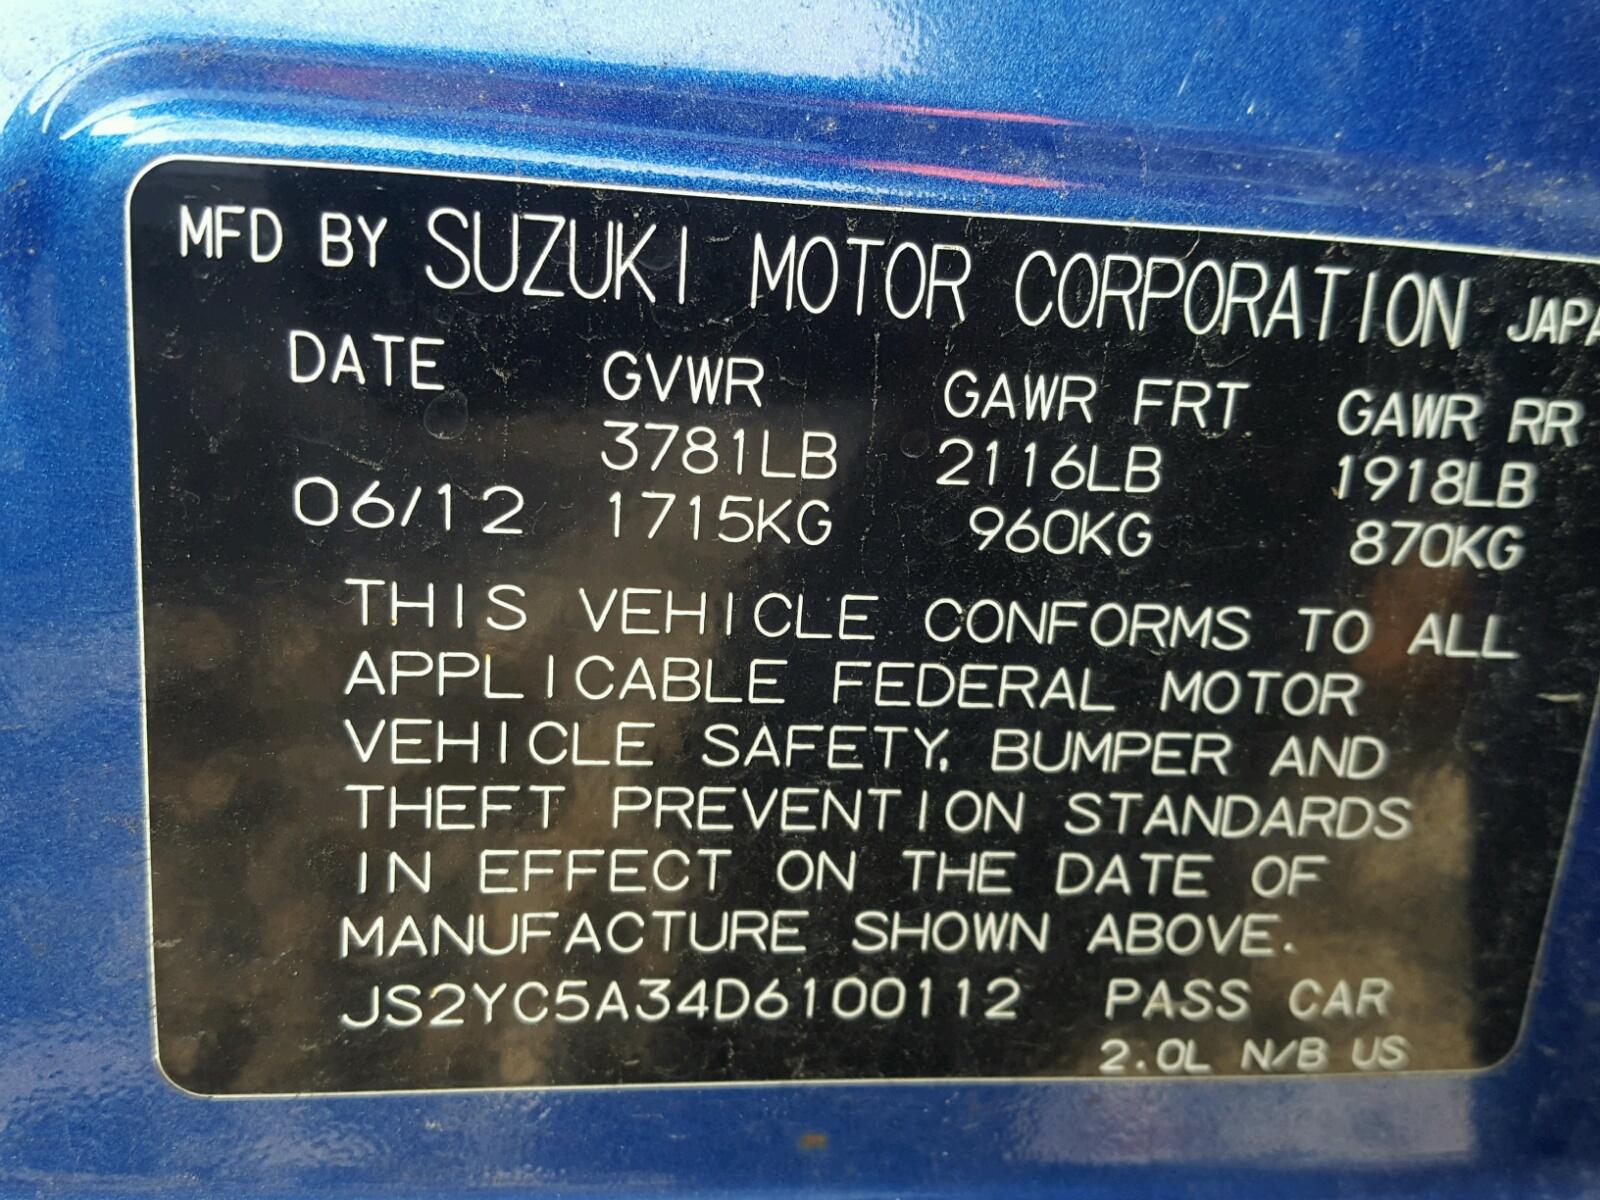 JS2YC5A34D6100112 - 2013 Suzuki Sx4 Le 2.0L